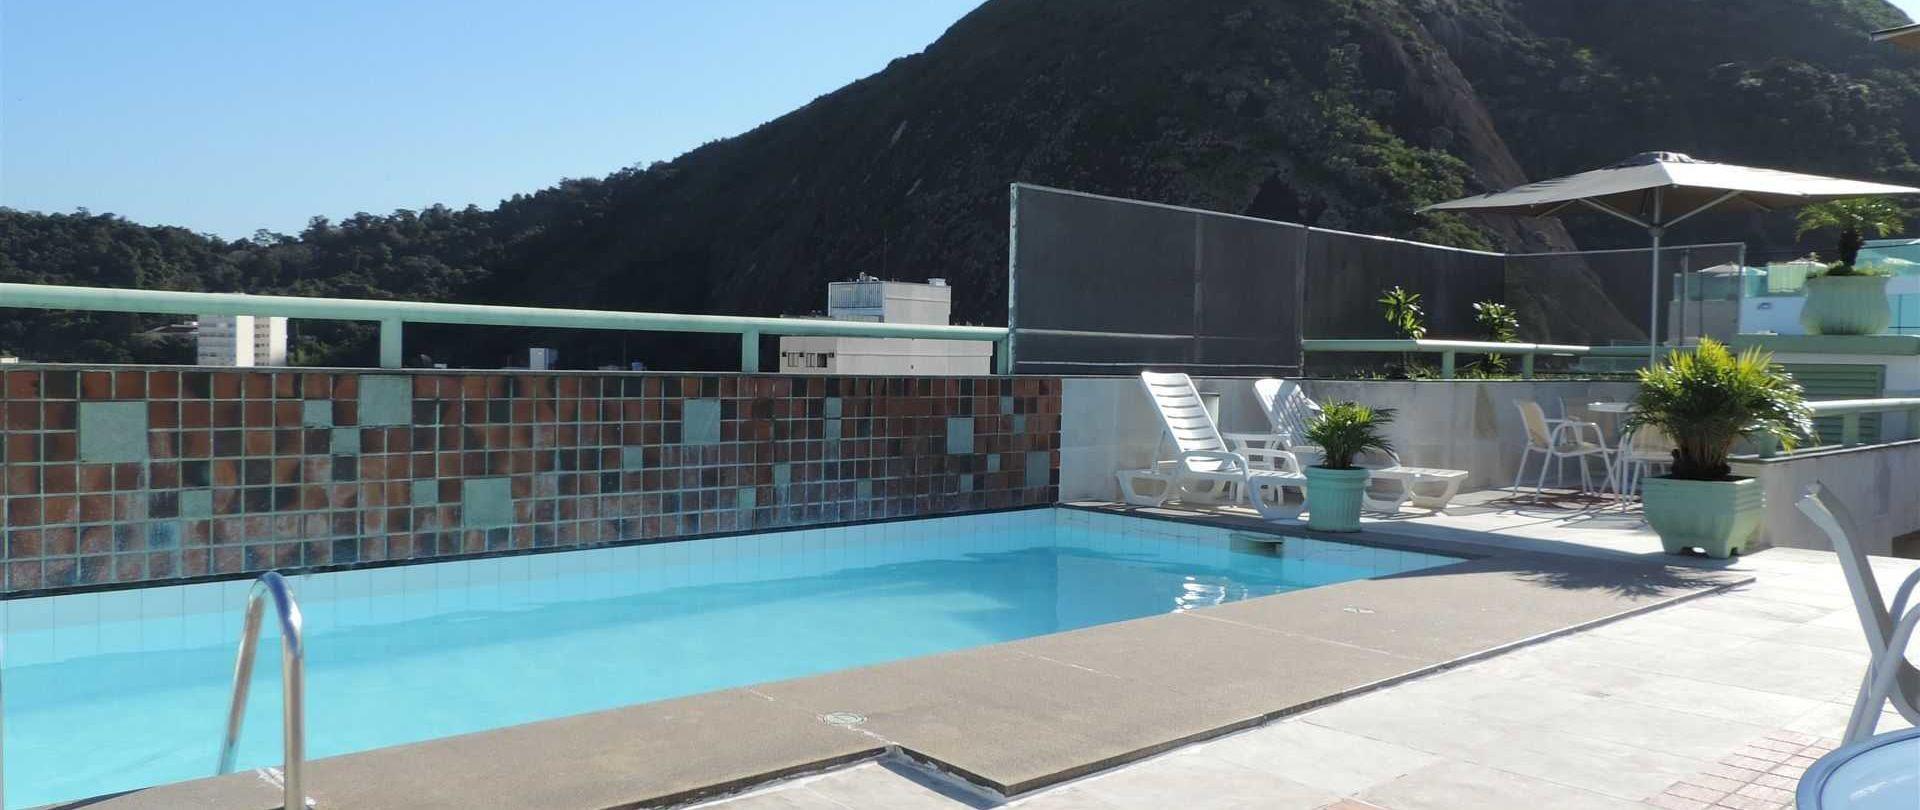 Américas Benidorm Hotel